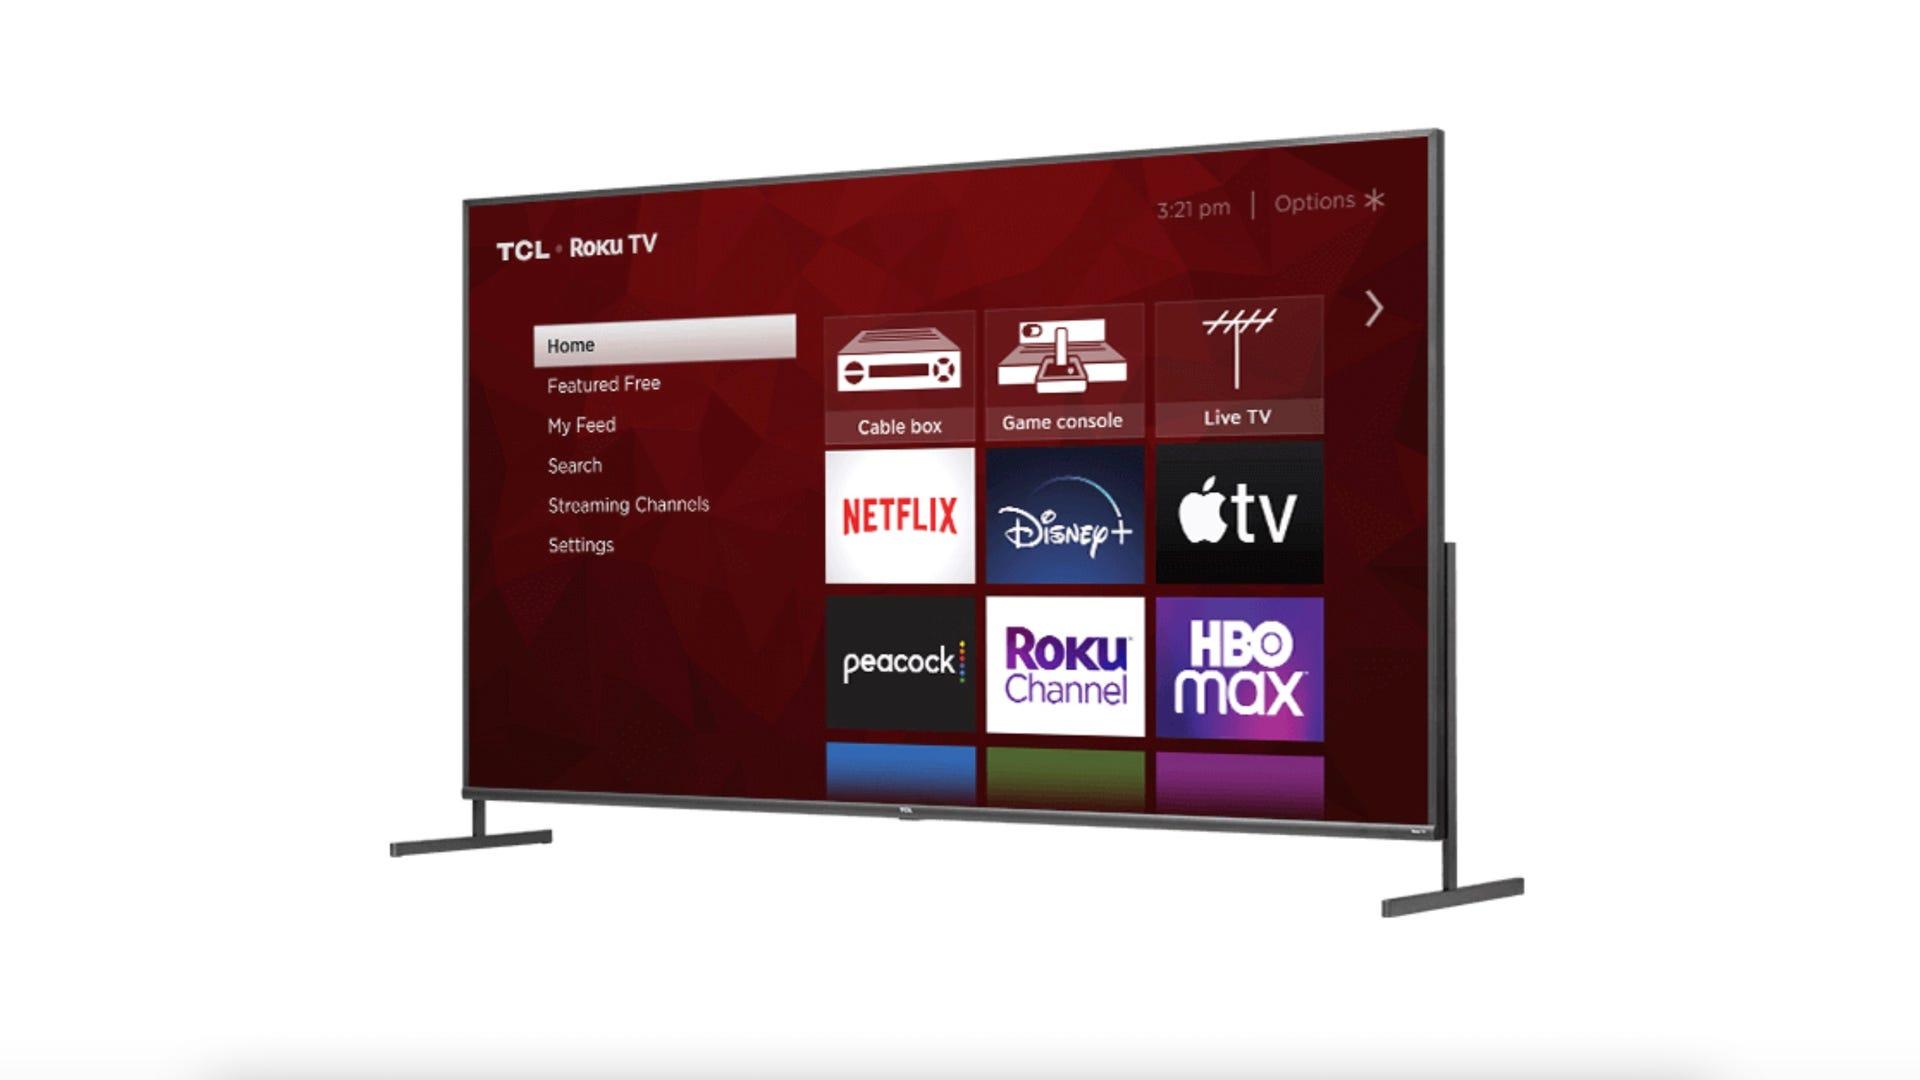 TCL 85-inch Roku TV